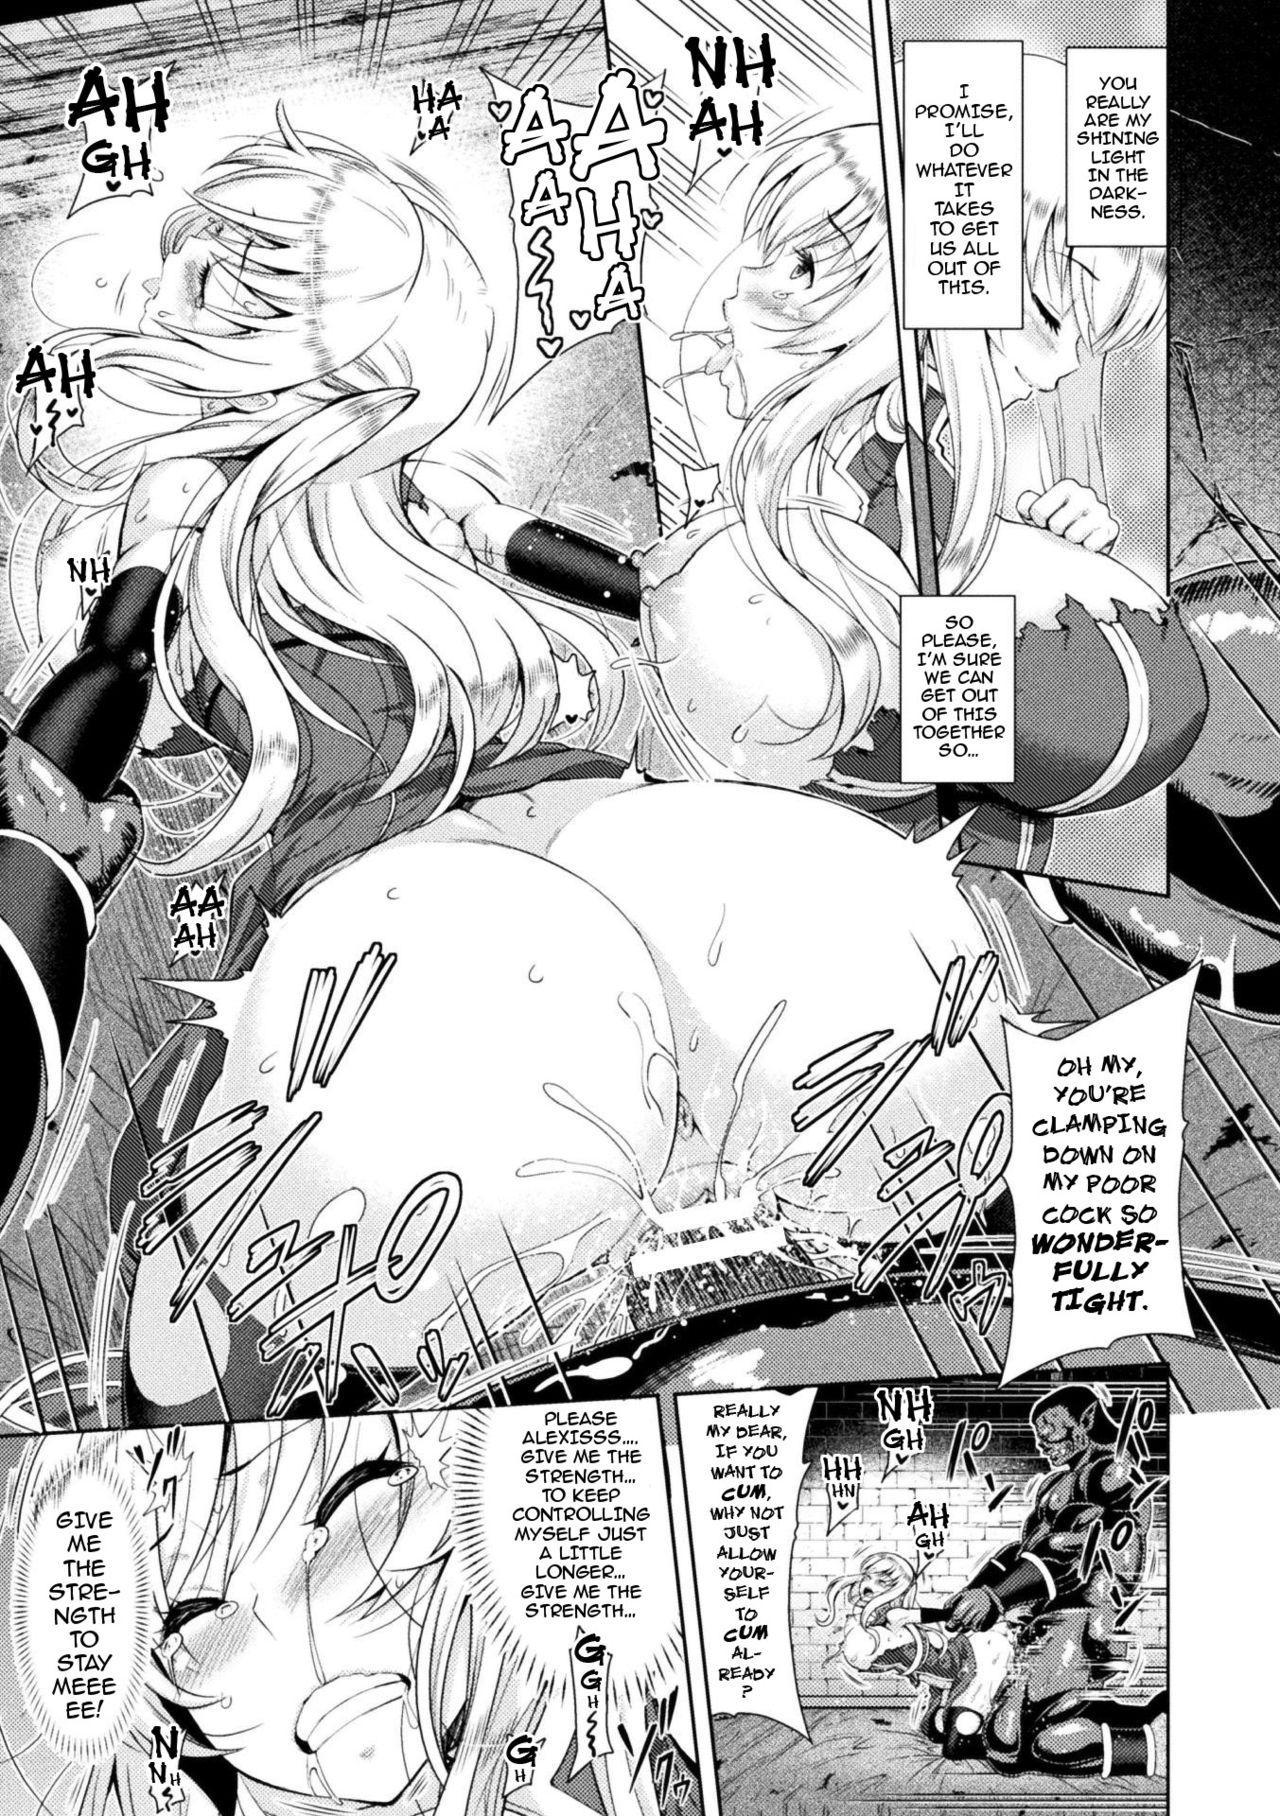 [Yamada Gogogo] Erona ~Orc no Inmon ni Okasareta Onna Kishi no Matsuro~ | Erona ~The Fall of a Beautiful Knight Cursed with the Lewd Mark of an Orc~ Ch. 1-3 [English] {darknight} 36